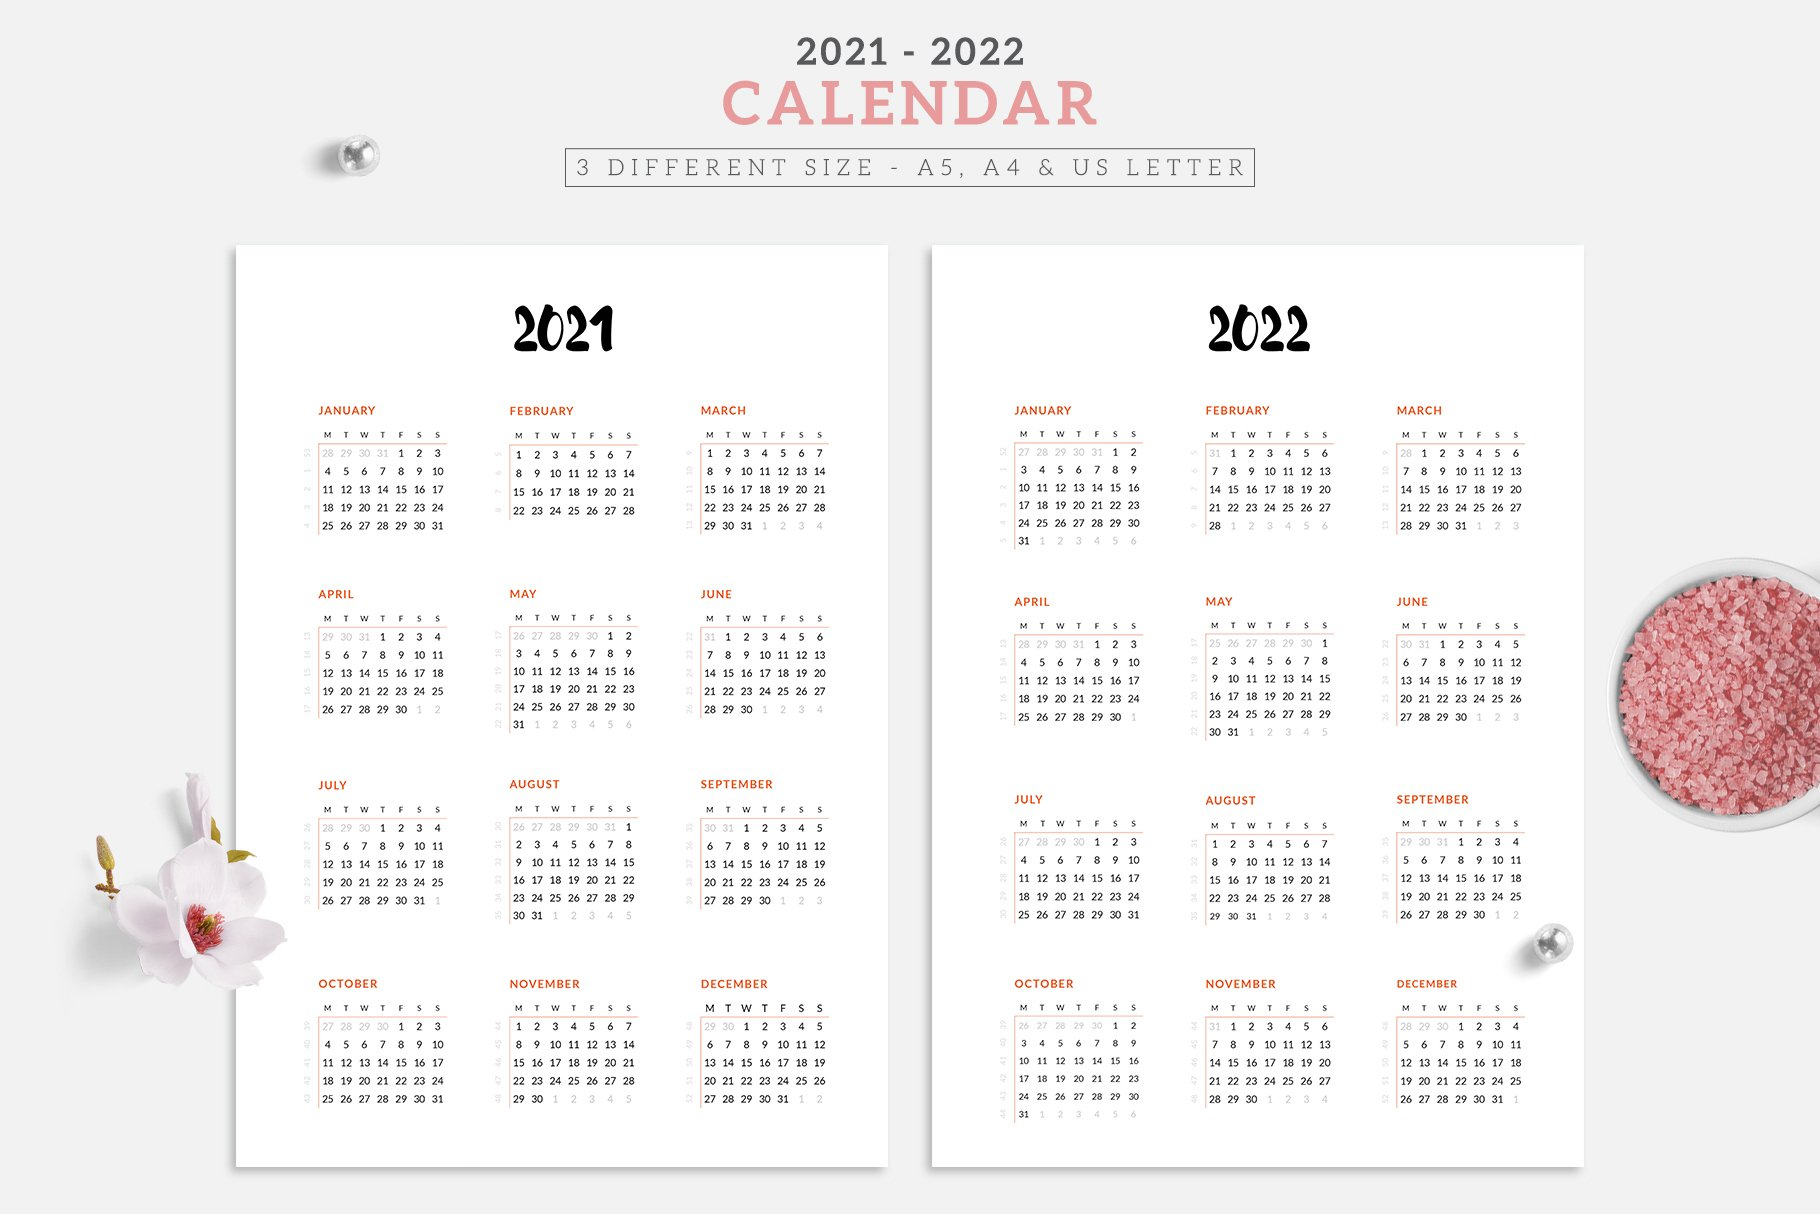 Free Indesign Calendar Template 2022.2021 2022 Minimal Calendar Design Creative Market